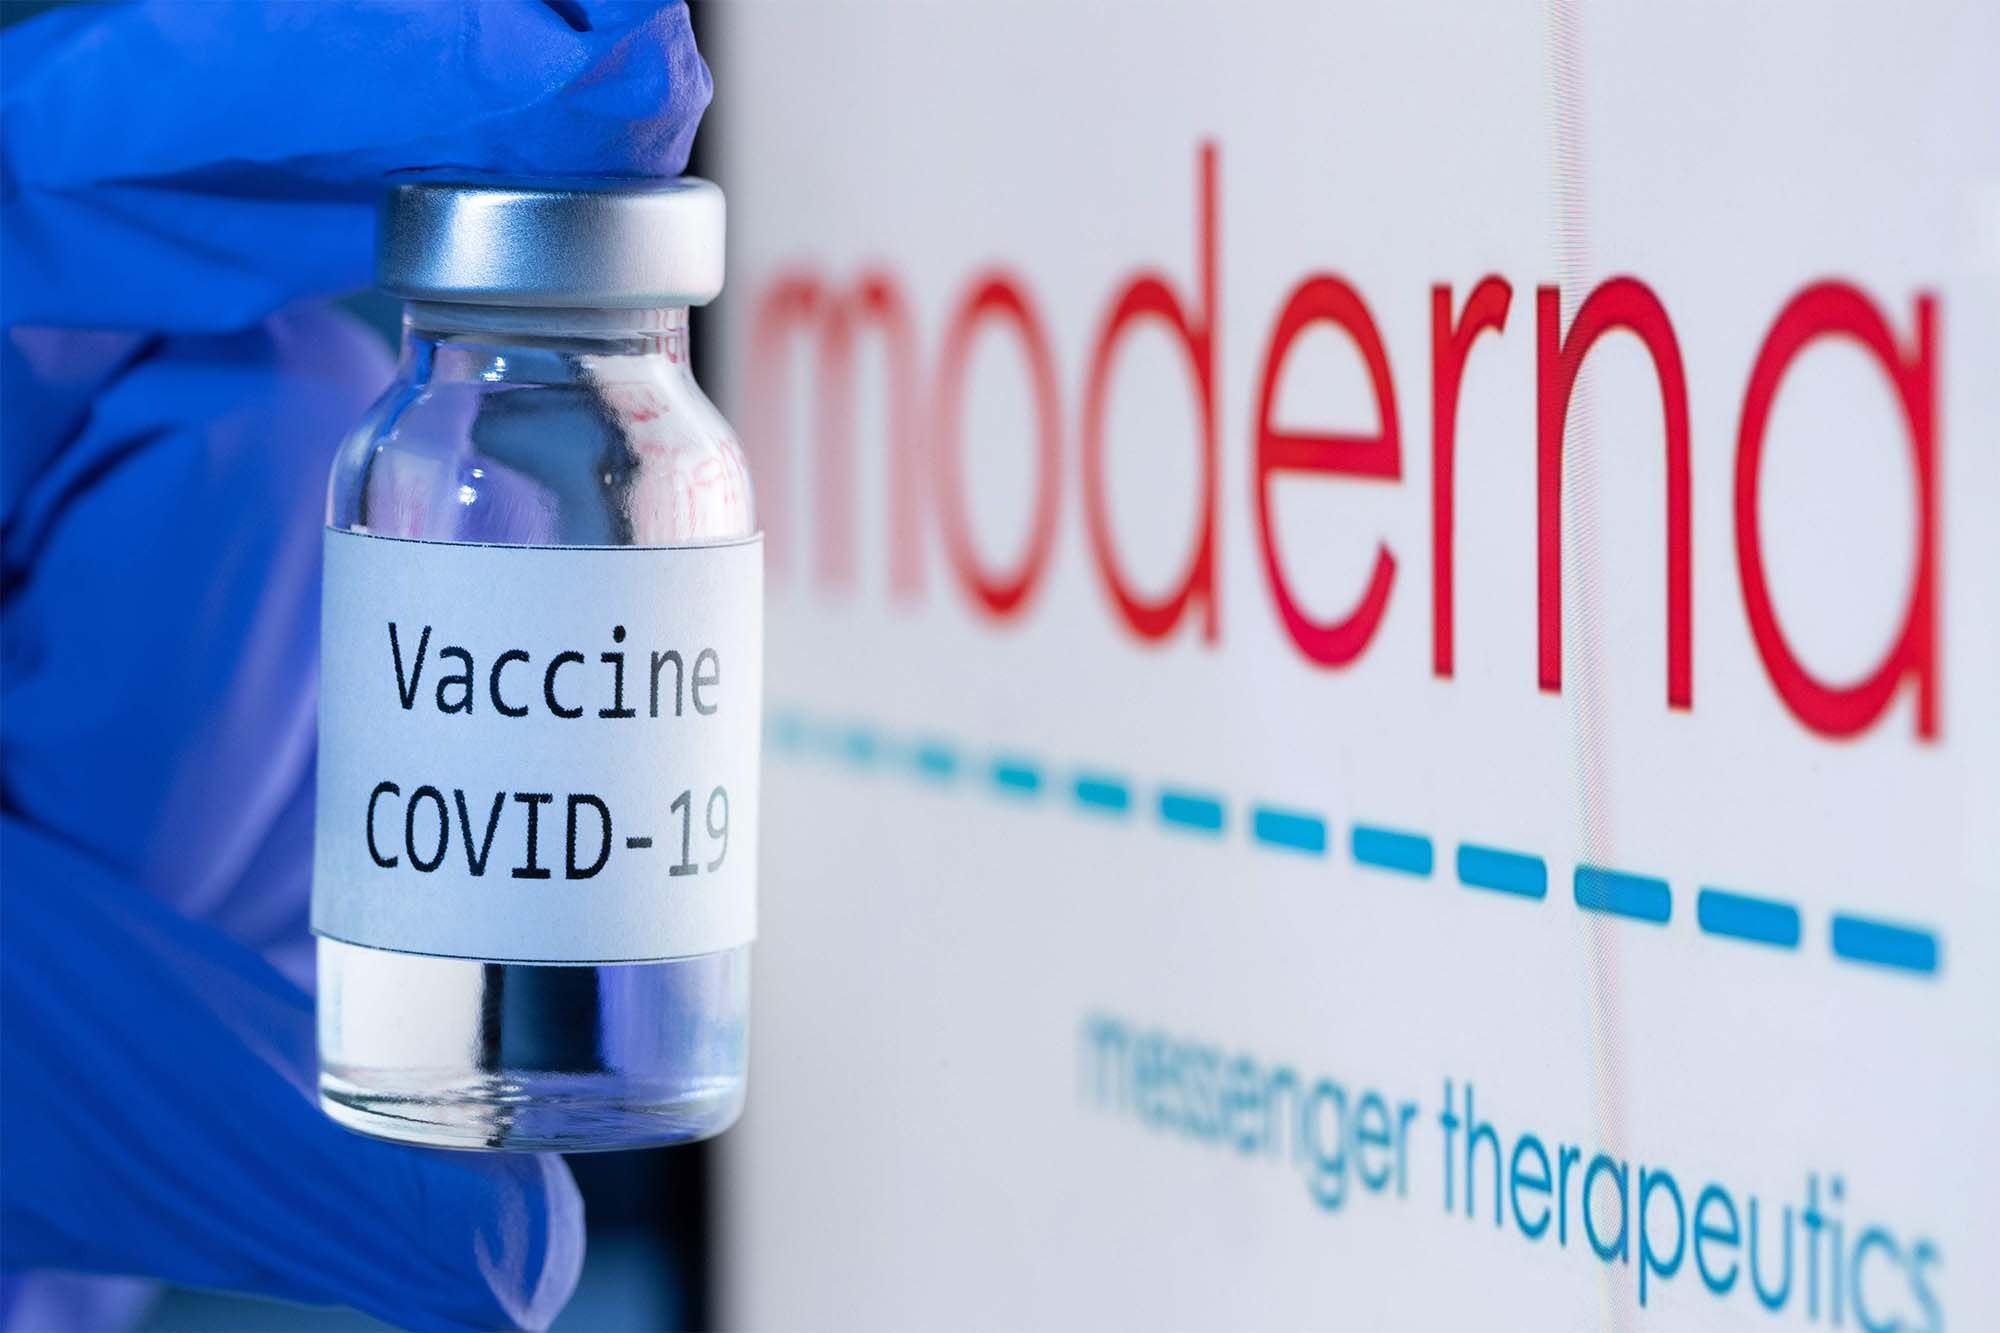 Moderna to test COVID-19 vaccine on children